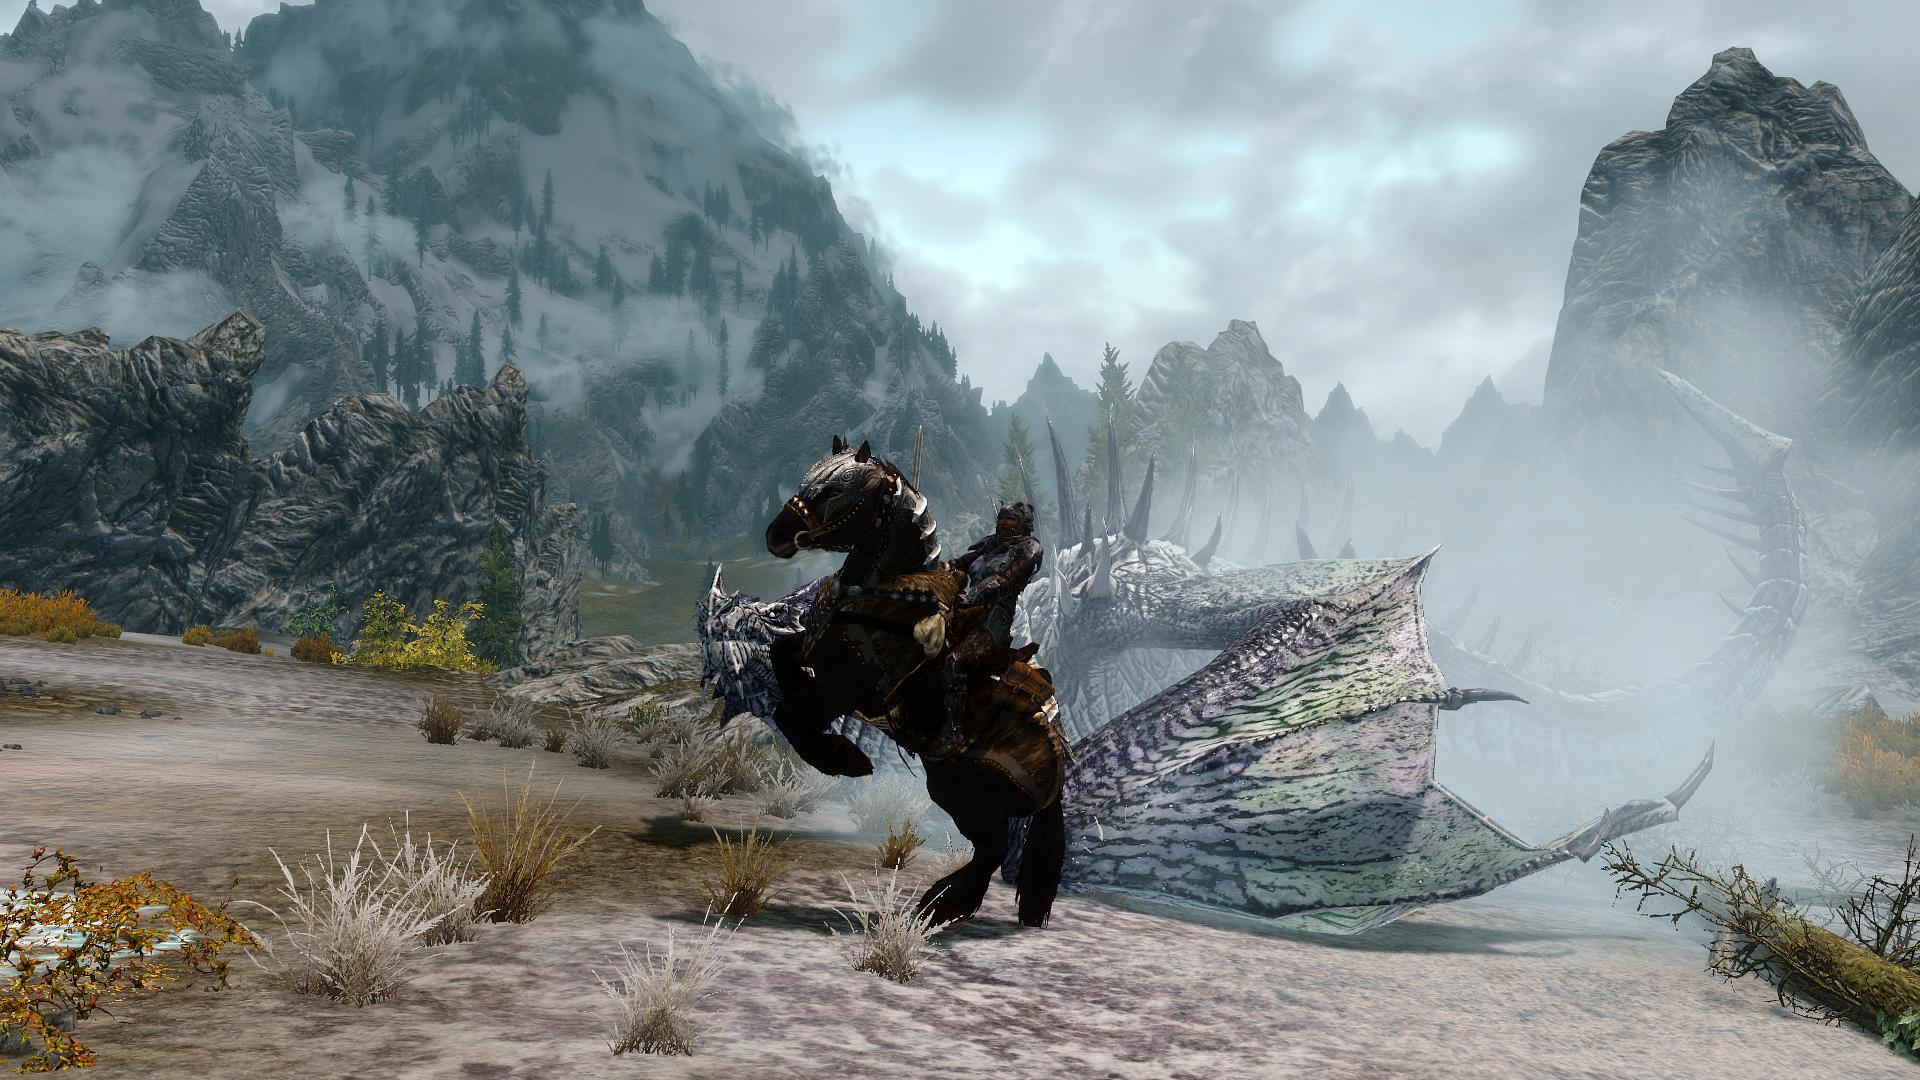 000221.Jpg - Elder Scrolls 5: Skyrim, the